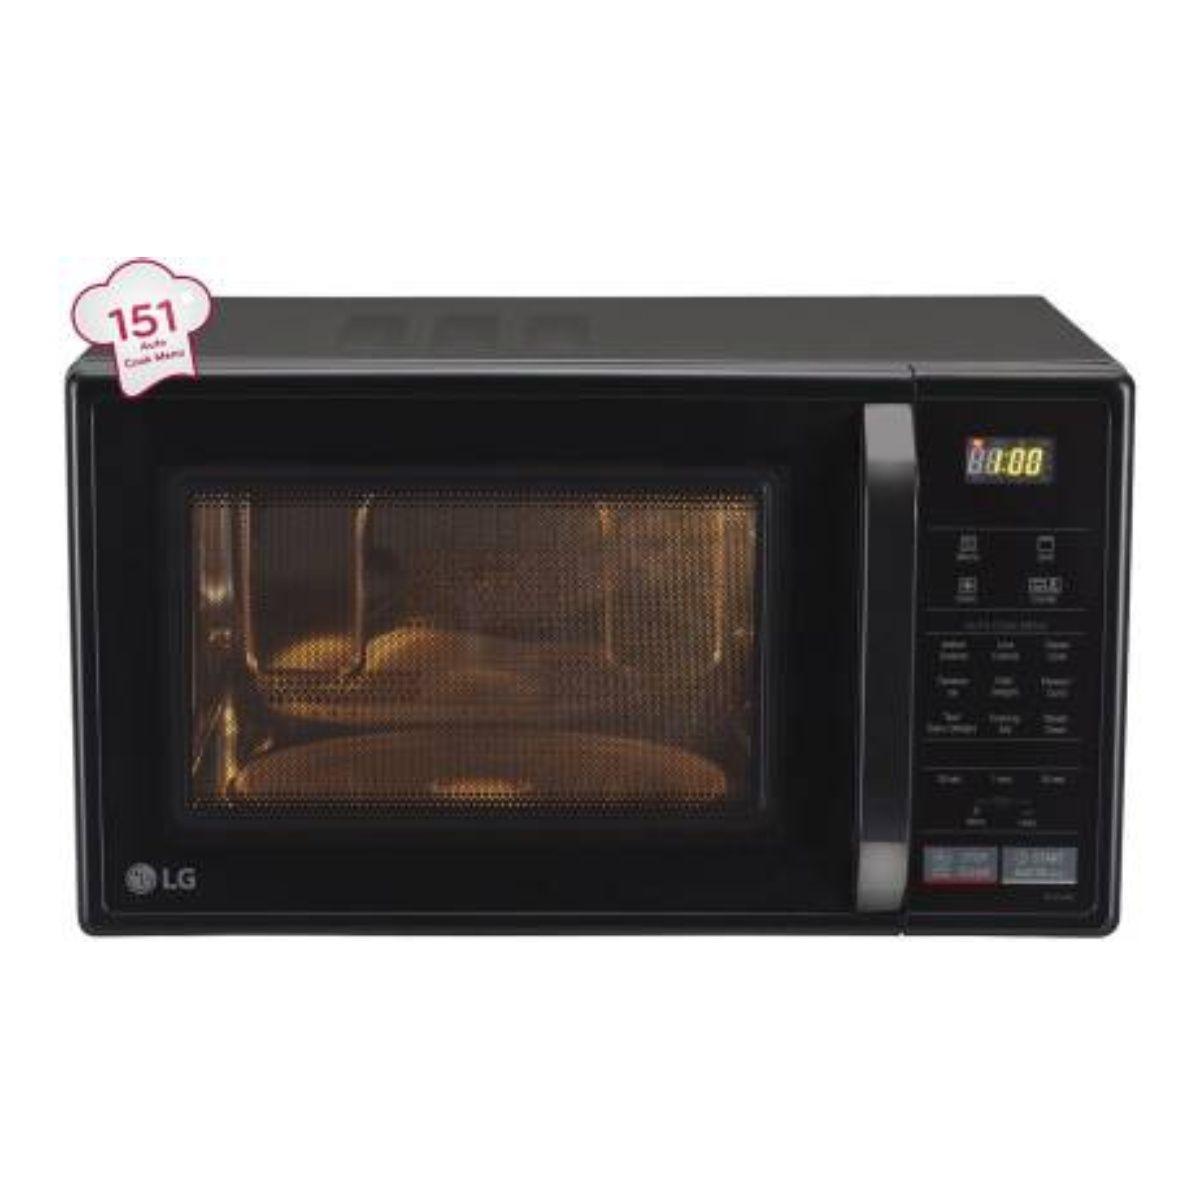 एलजी MC2146BL 21 L Microwave oven